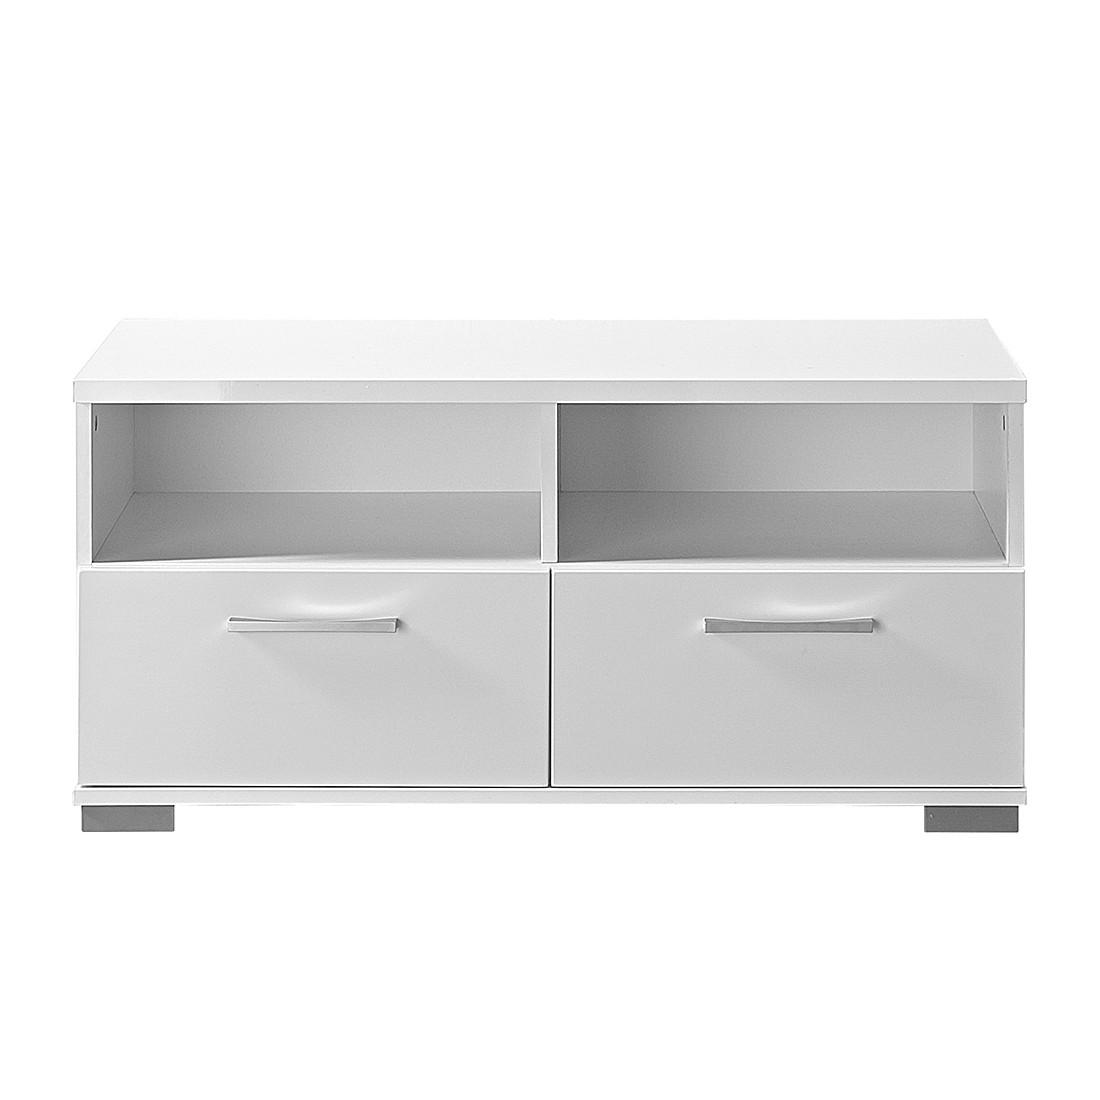 schuhbank campo hochglanz wei sitzbank garderobe. Black Bedroom Furniture Sets. Home Design Ideas